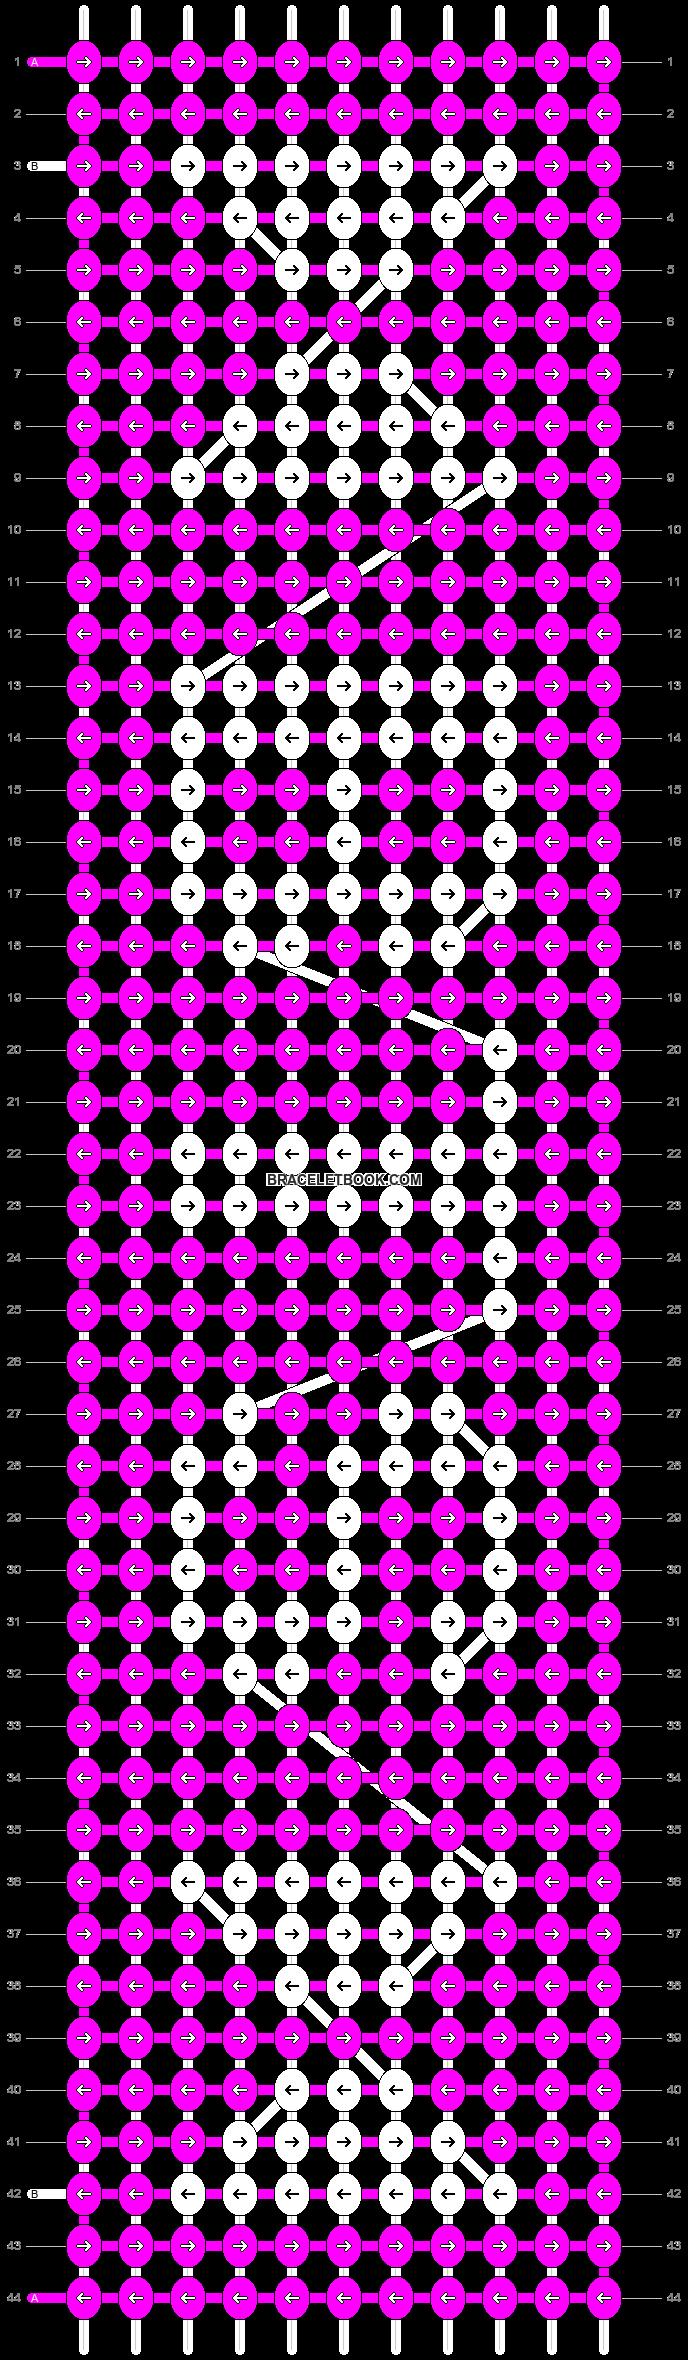 Alpha pattern #40662 pattern